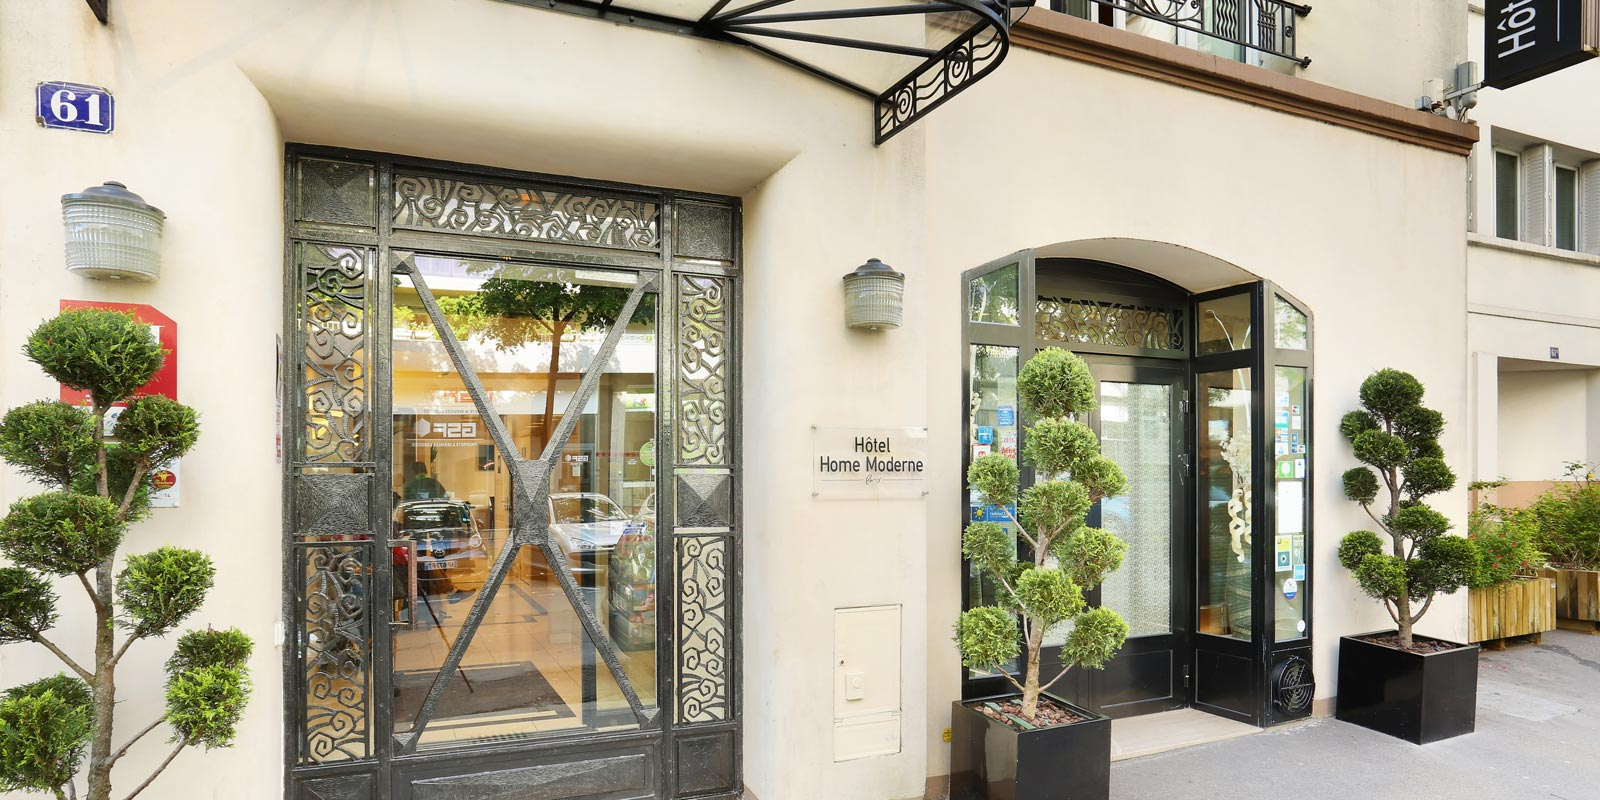 hotel home moderne paris ouvert